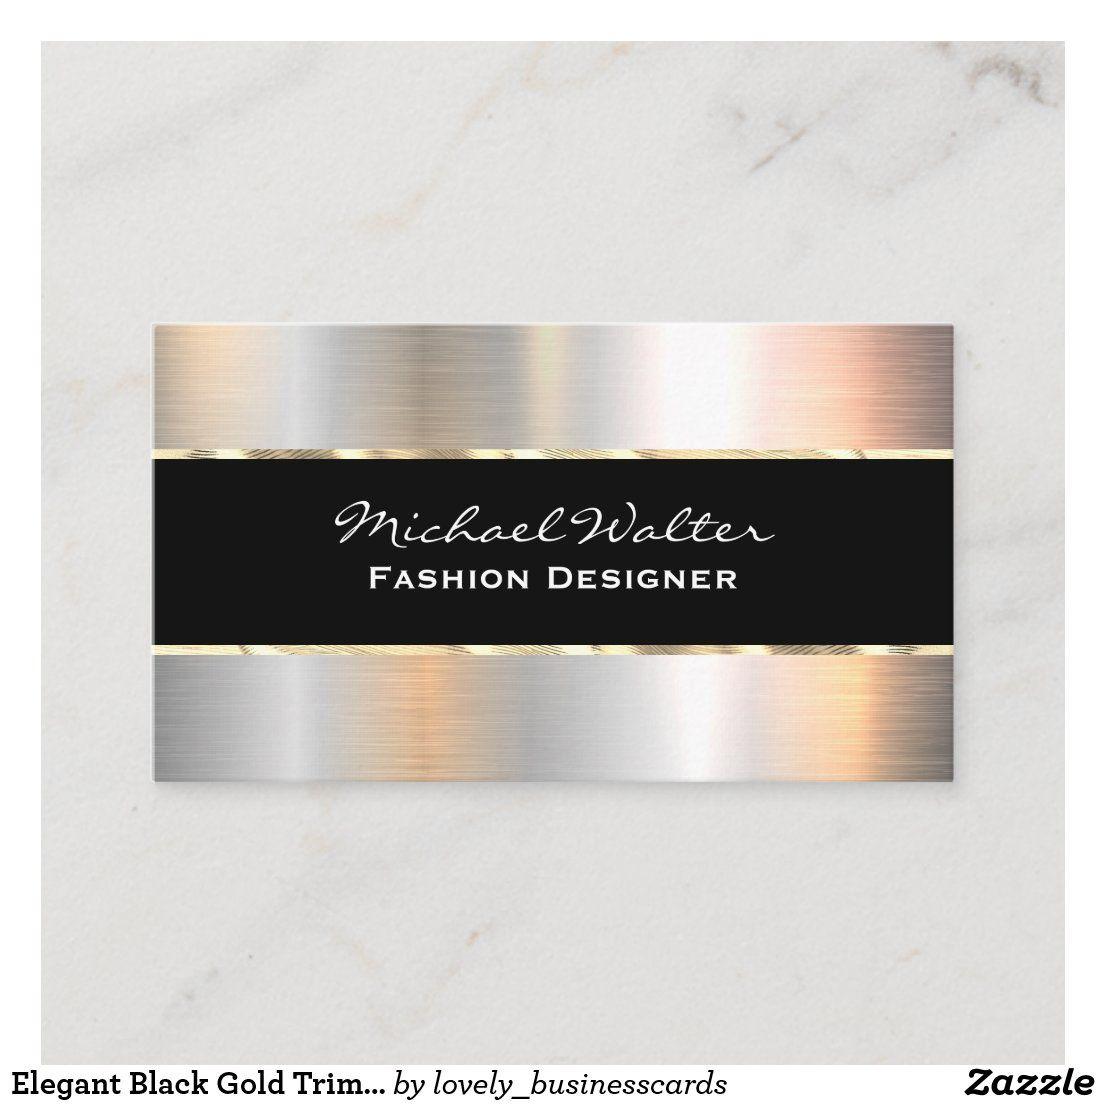 Elegant Black Gold Trim Silver Metallic Business Card Zazzle Com Metallic Silver Black Gold Gold Trim